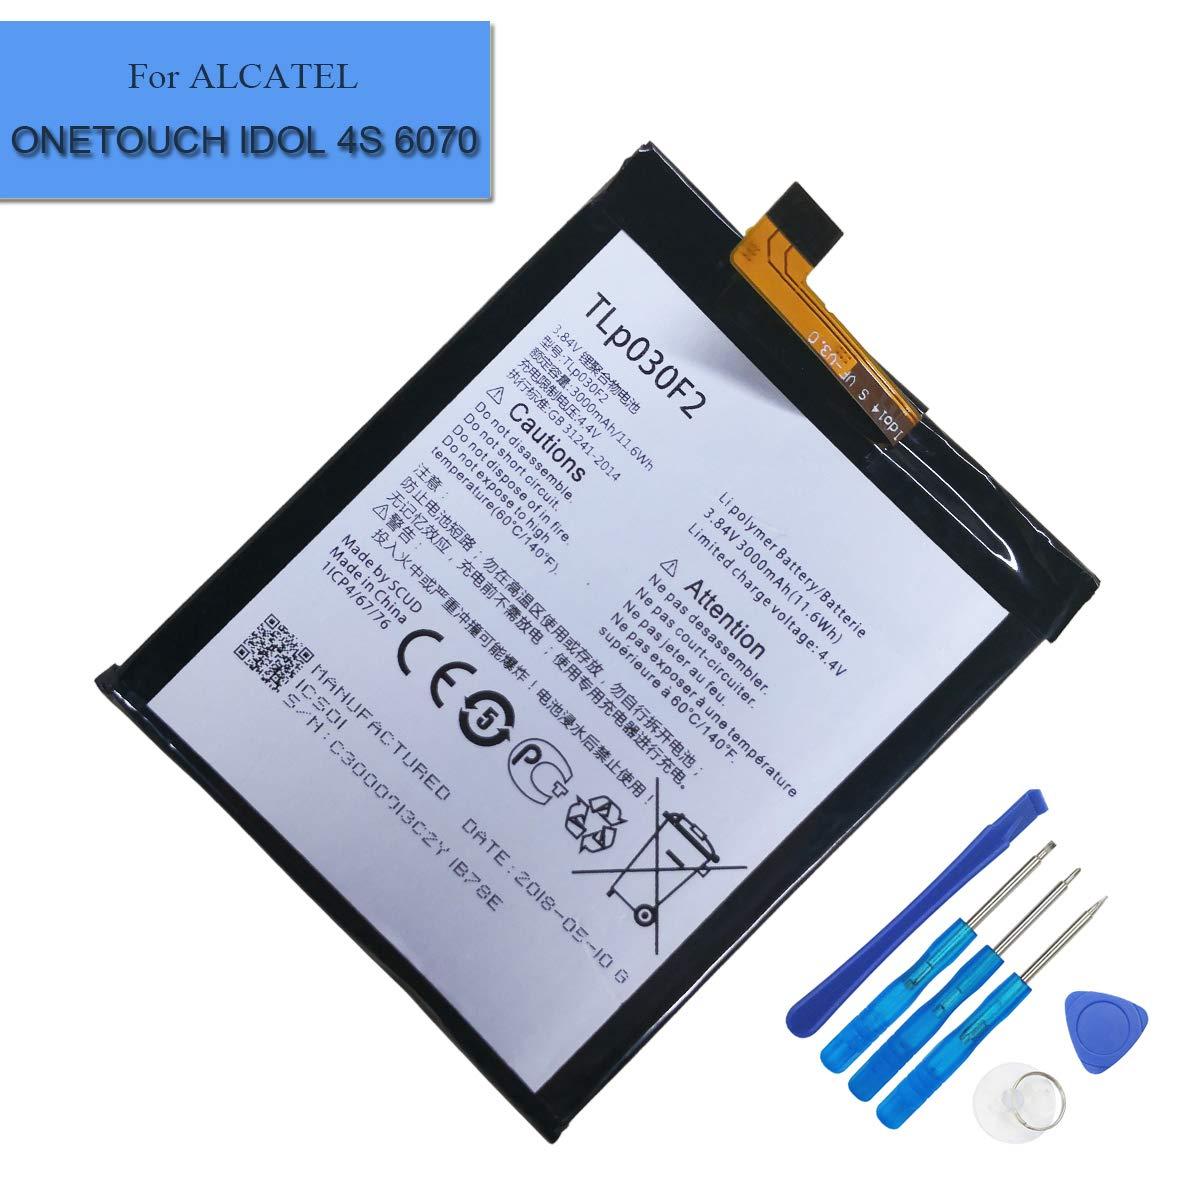 Bateria Celular Tlp030f2 Compatible Con Alcatel One Touch Idol 4s,ot 6070, Blackberry Dtek60 Tlp030f1 Vodafone Smart Pla